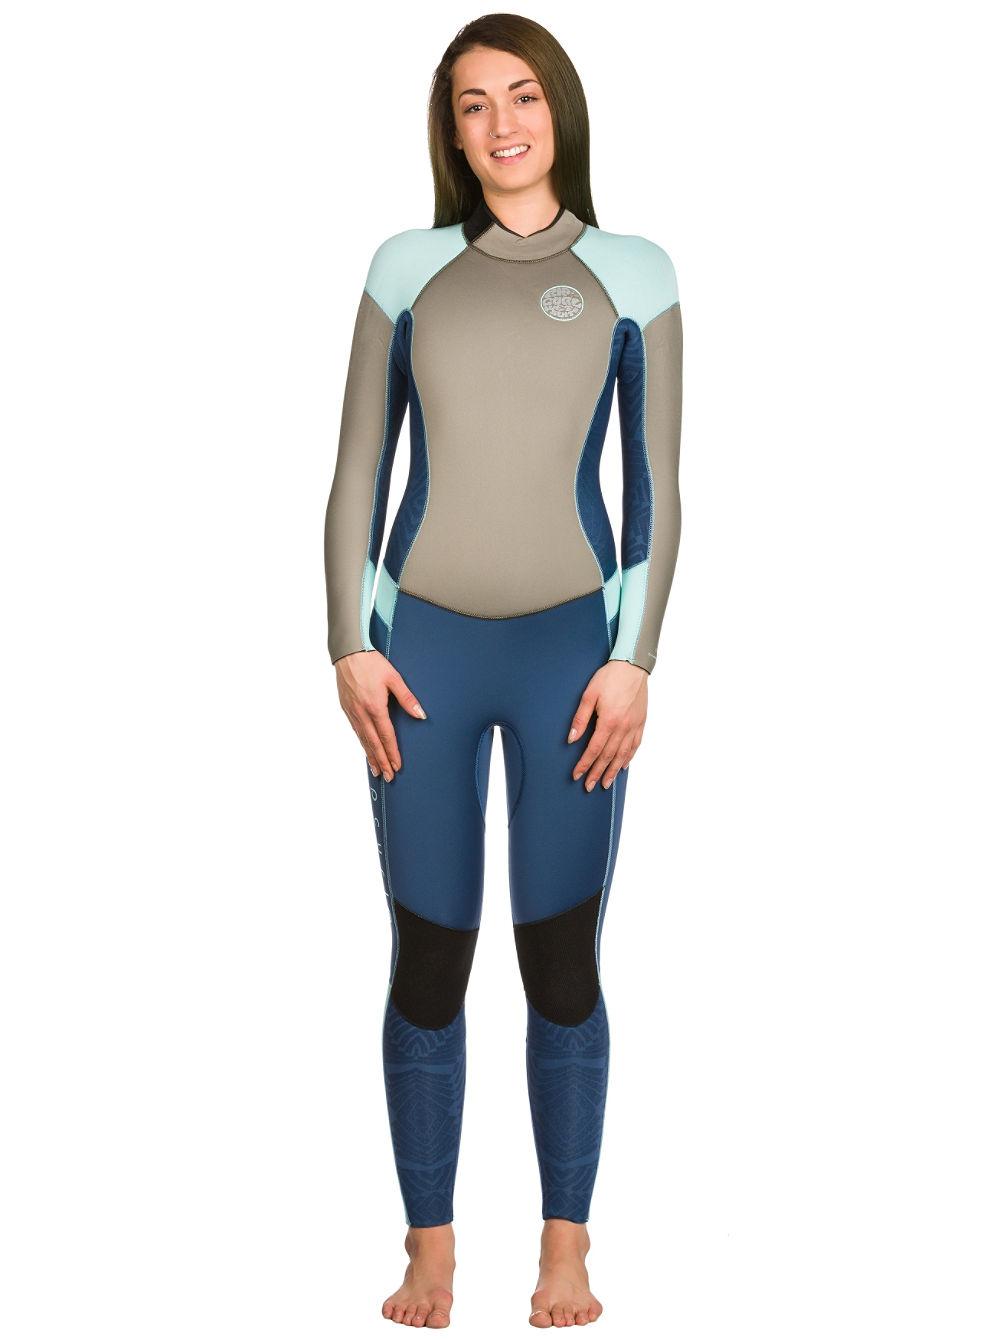 rip-curl-dawn-patrol-53-back-zip-wetsuit